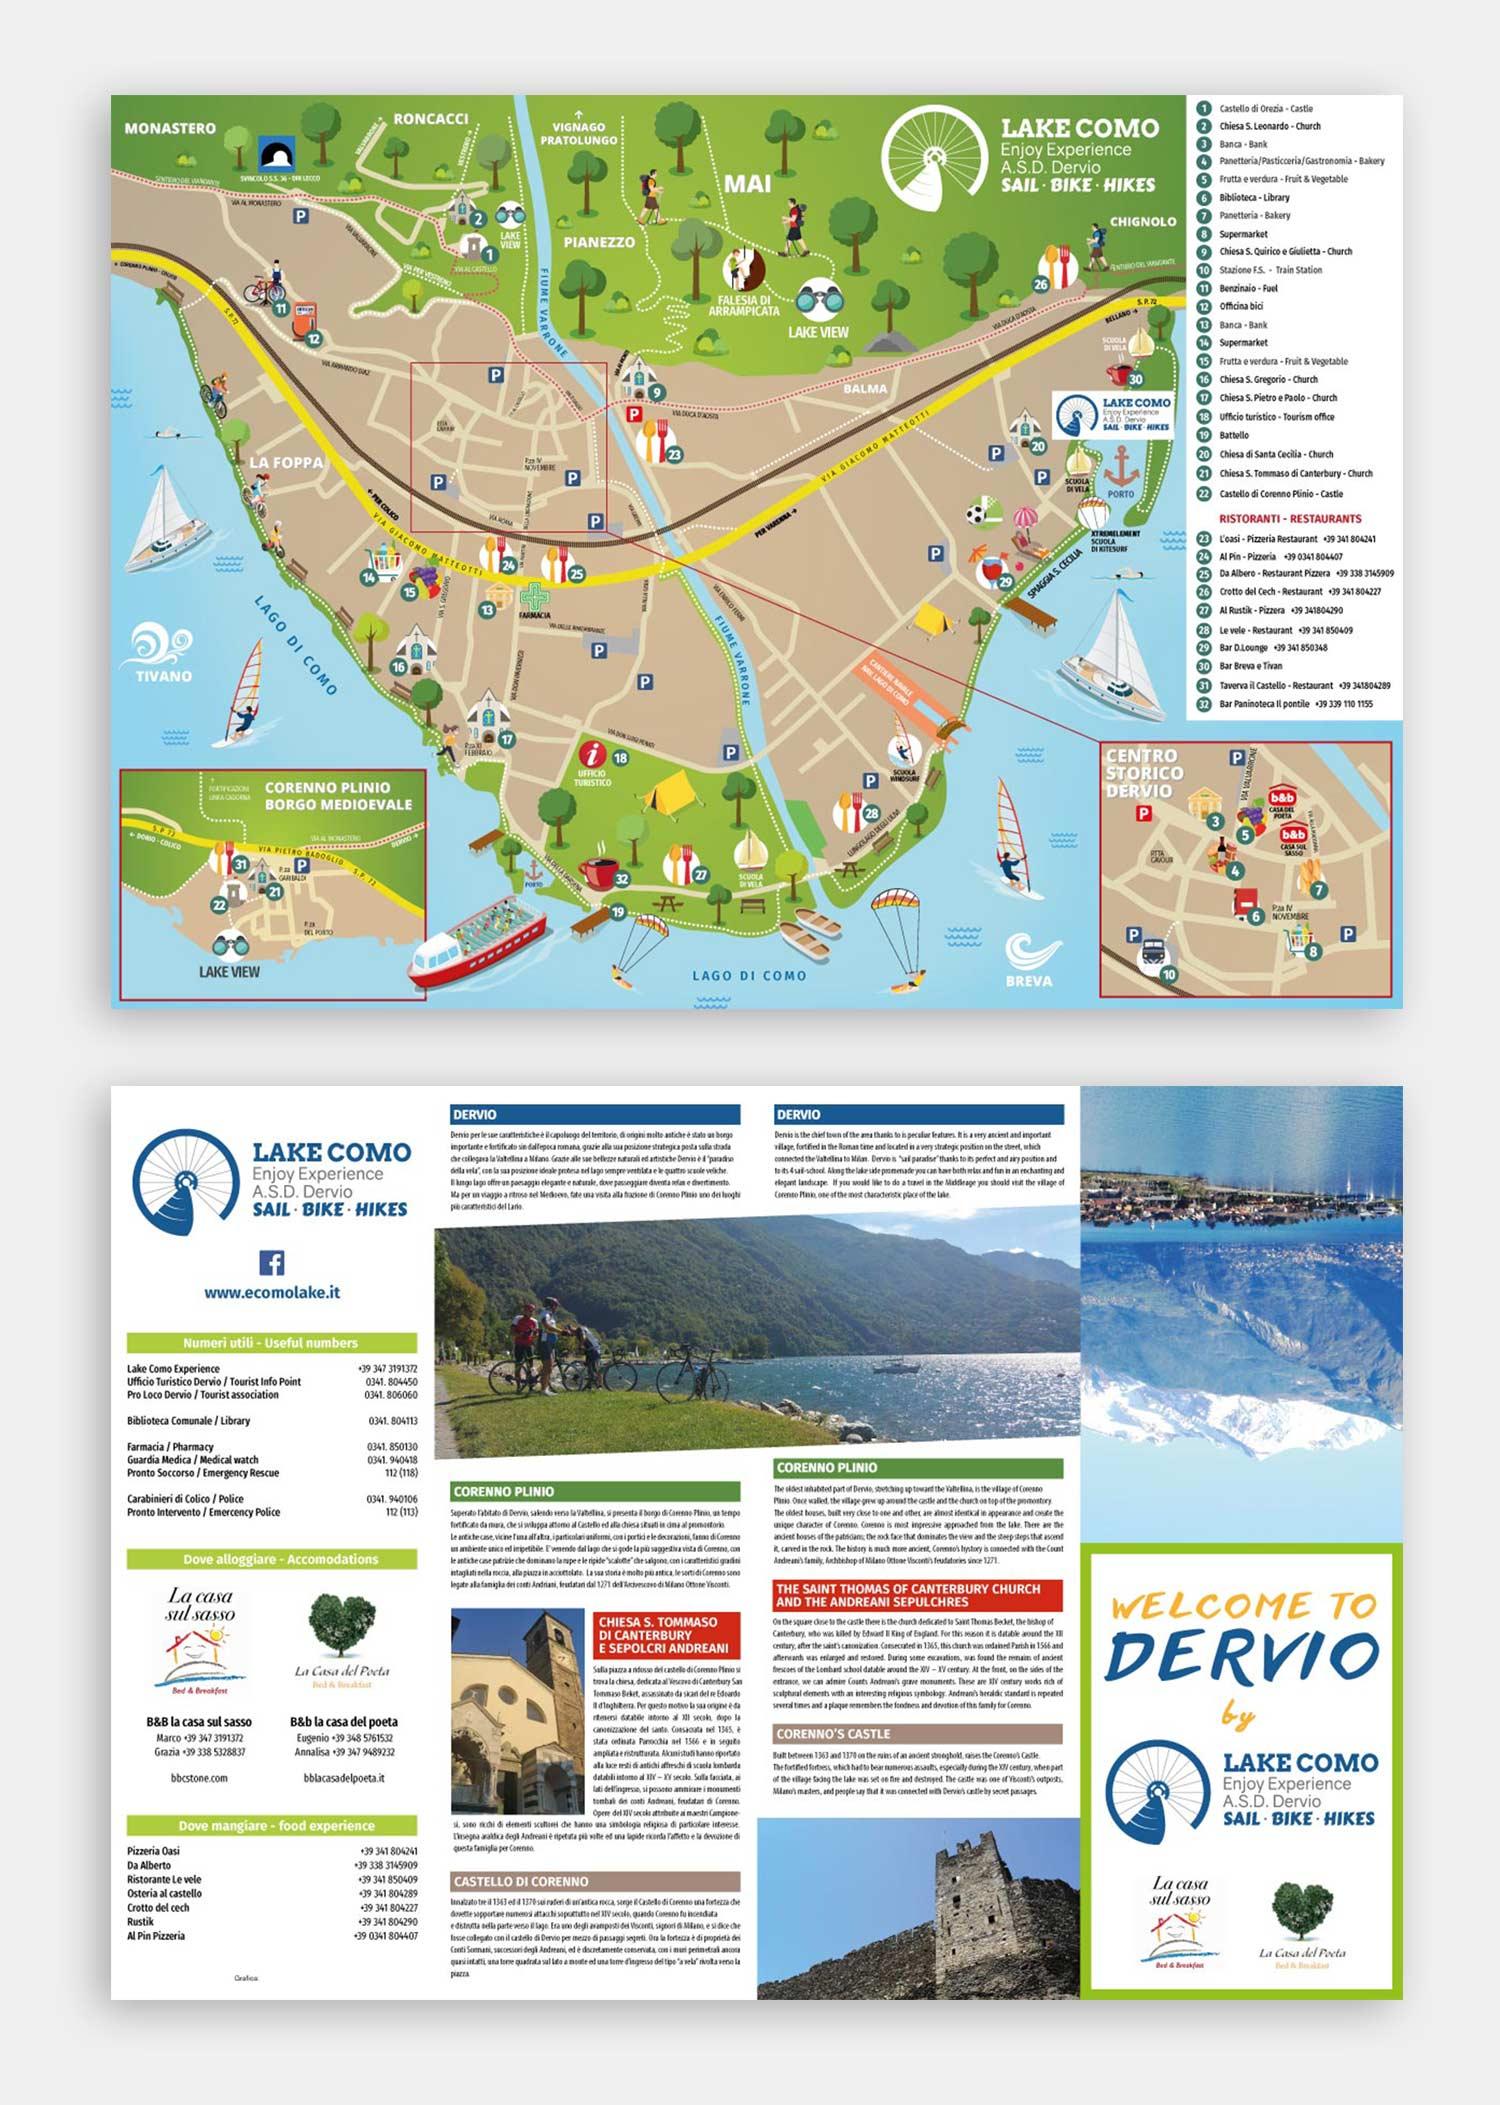 dervio-mappa